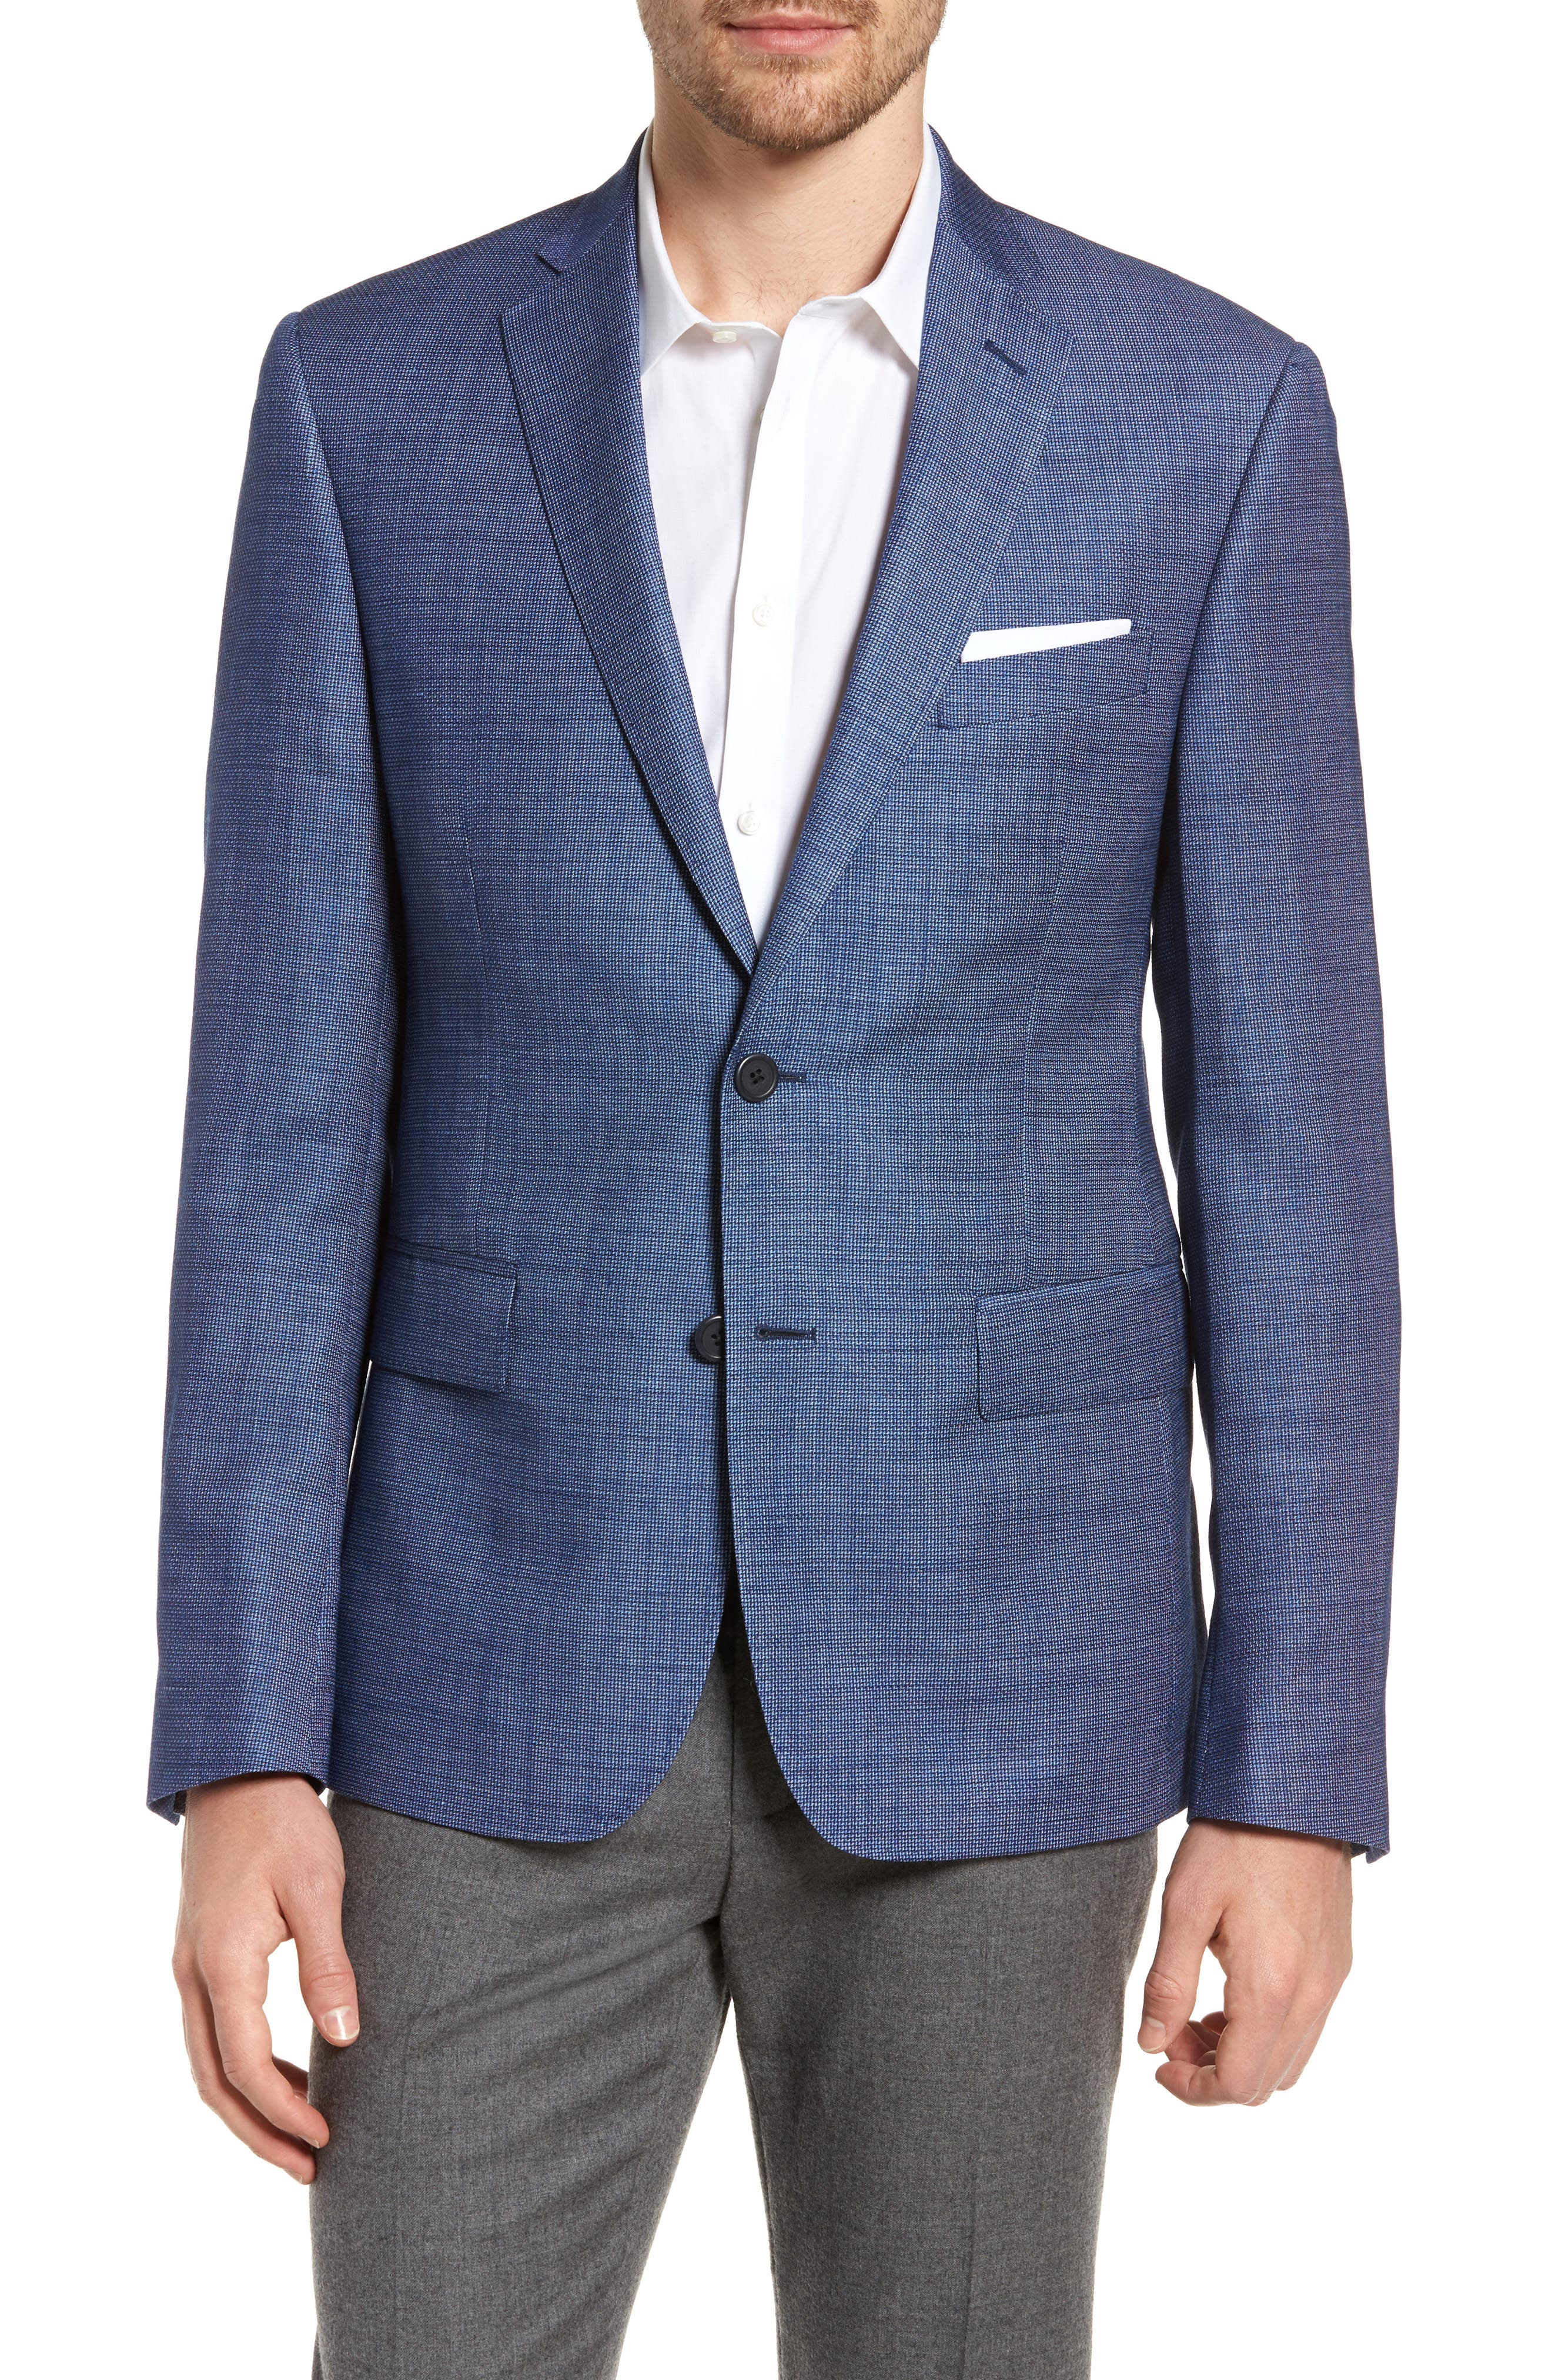 Extra Trim Fit Wool & Linen Blazer,                             Main thumbnail 1, color,                             401